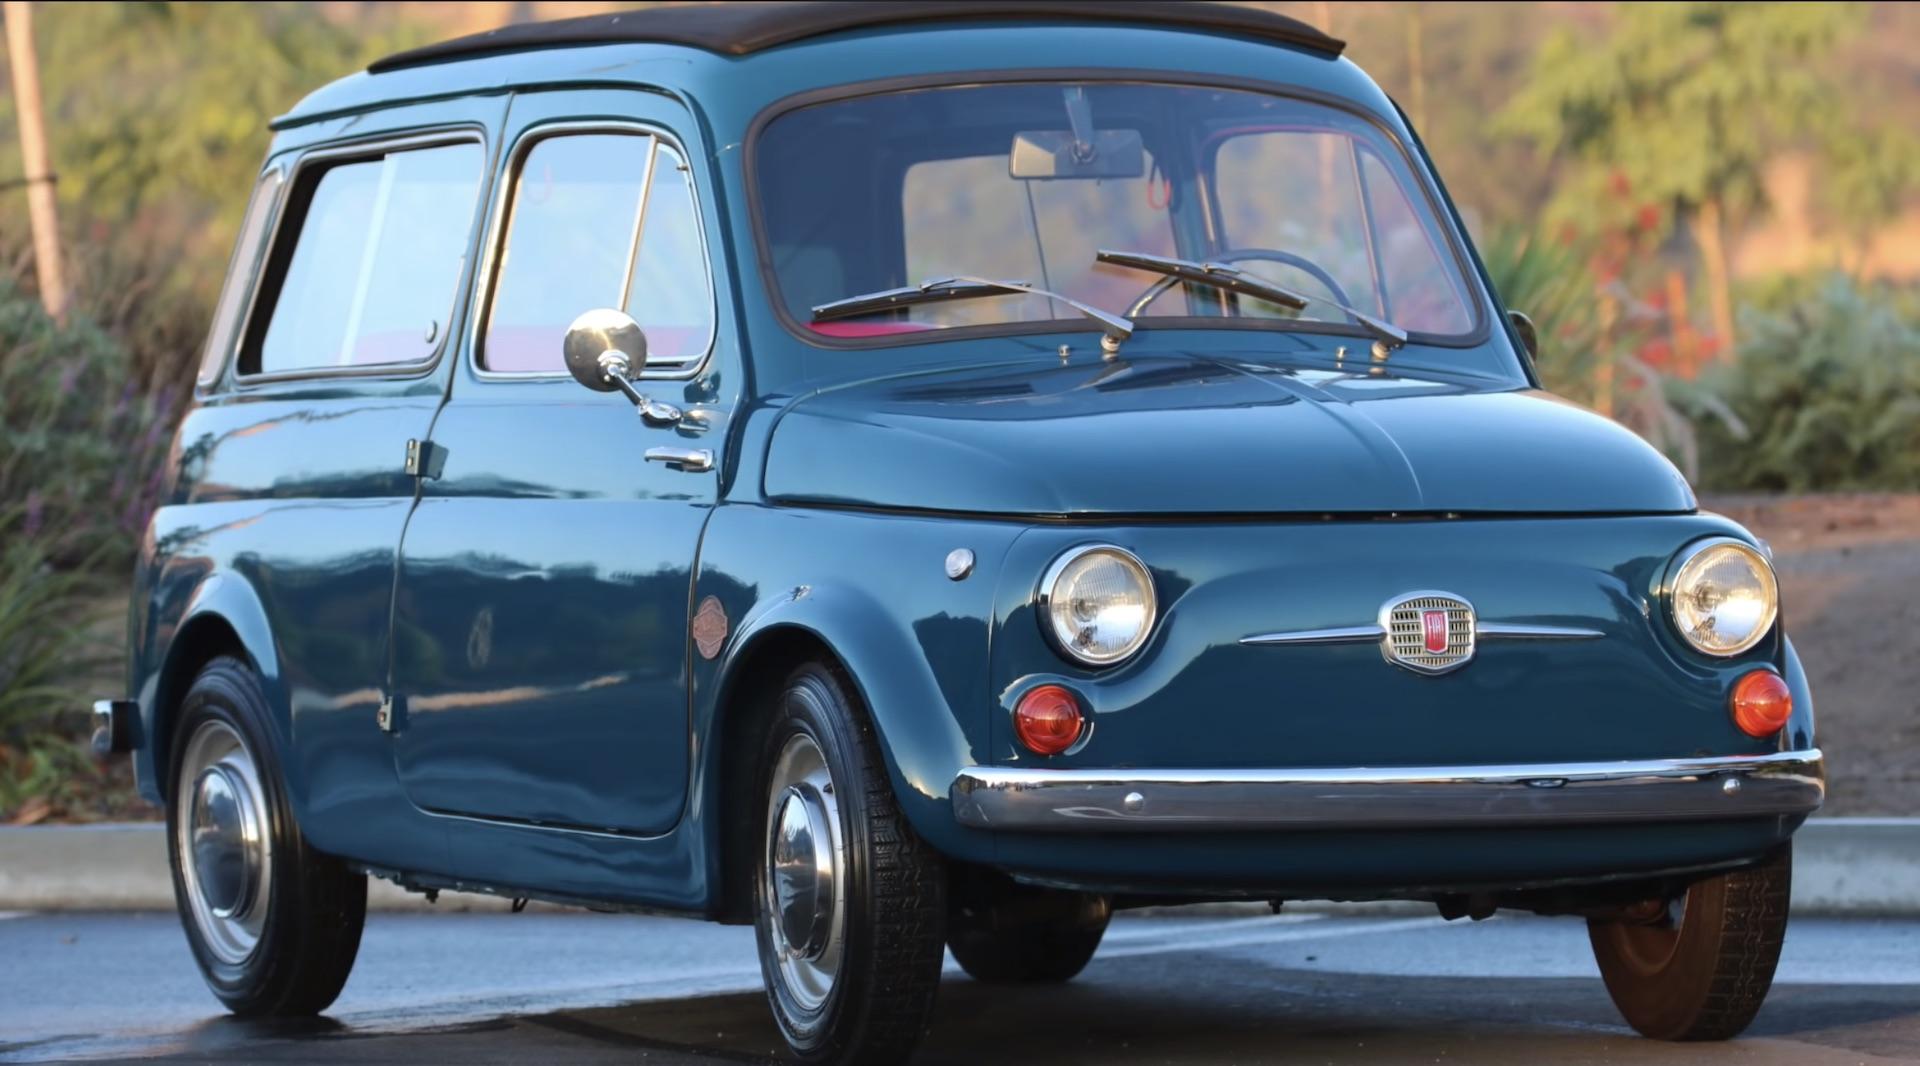 Icon Adds Electric Powertrain To 1966 Fiat 500 Giardiniera Derelict